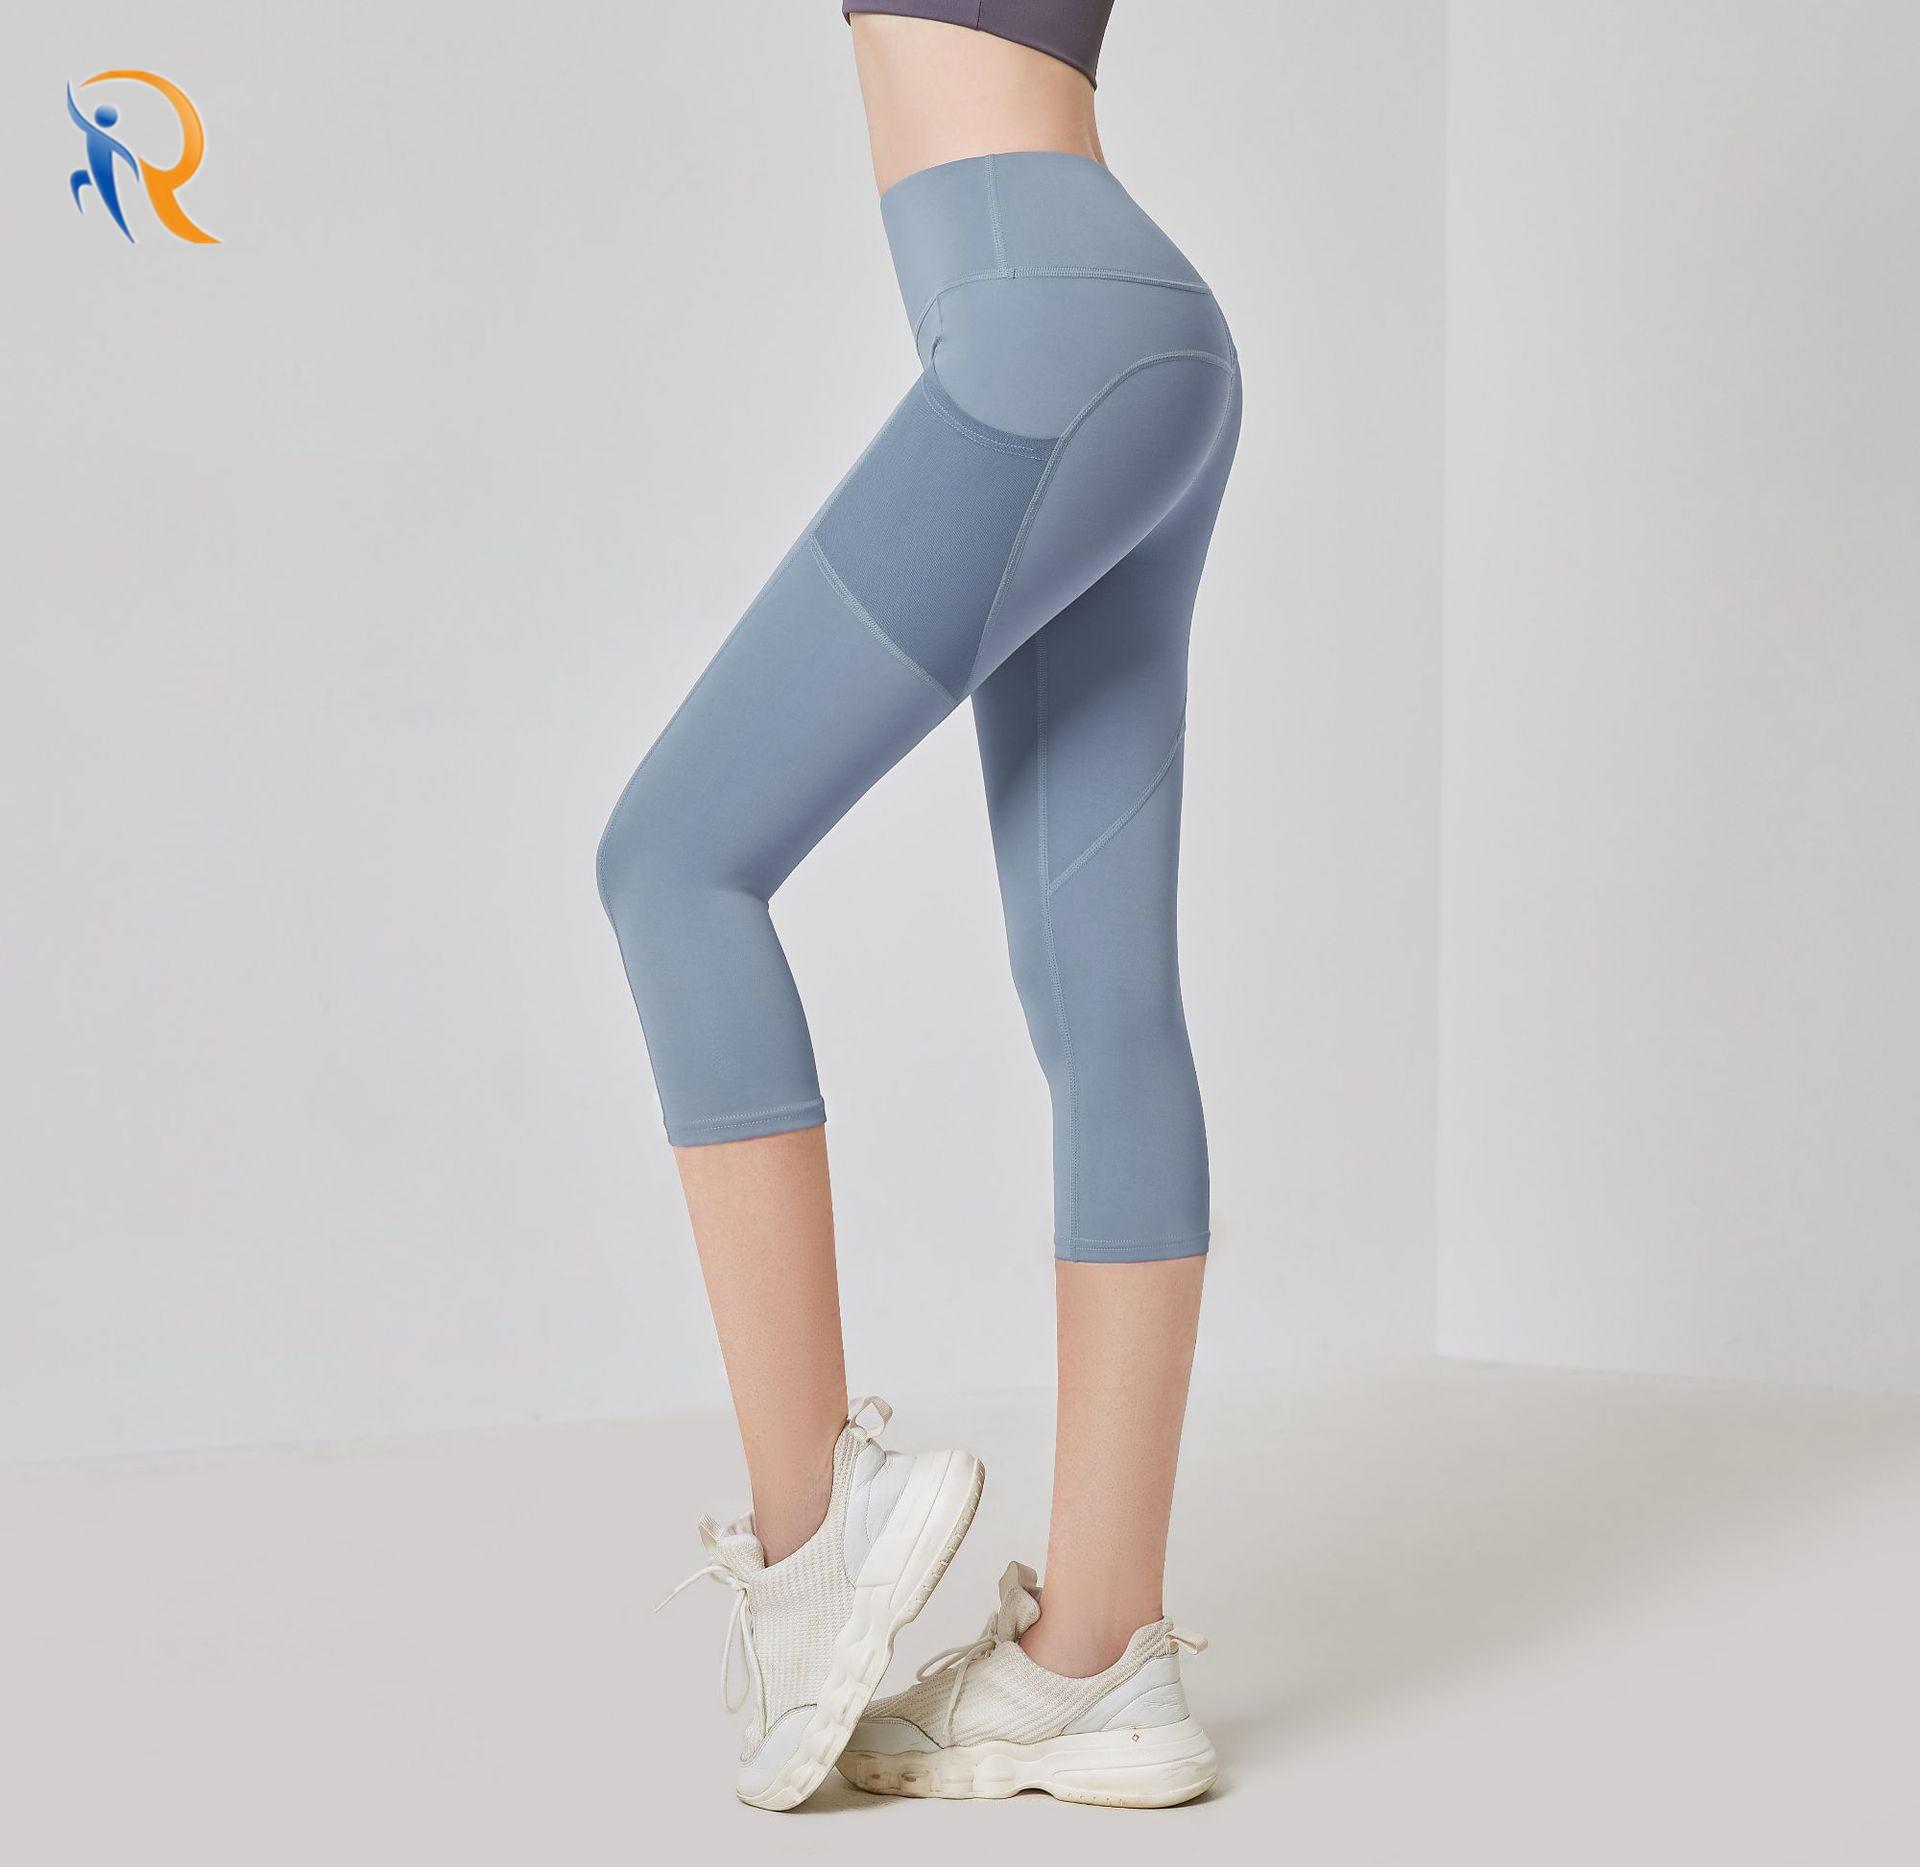 Side Pockets Cropped Yoga Pants Women High Waist Gym Fitness Pants Sports Tights Capri Legging